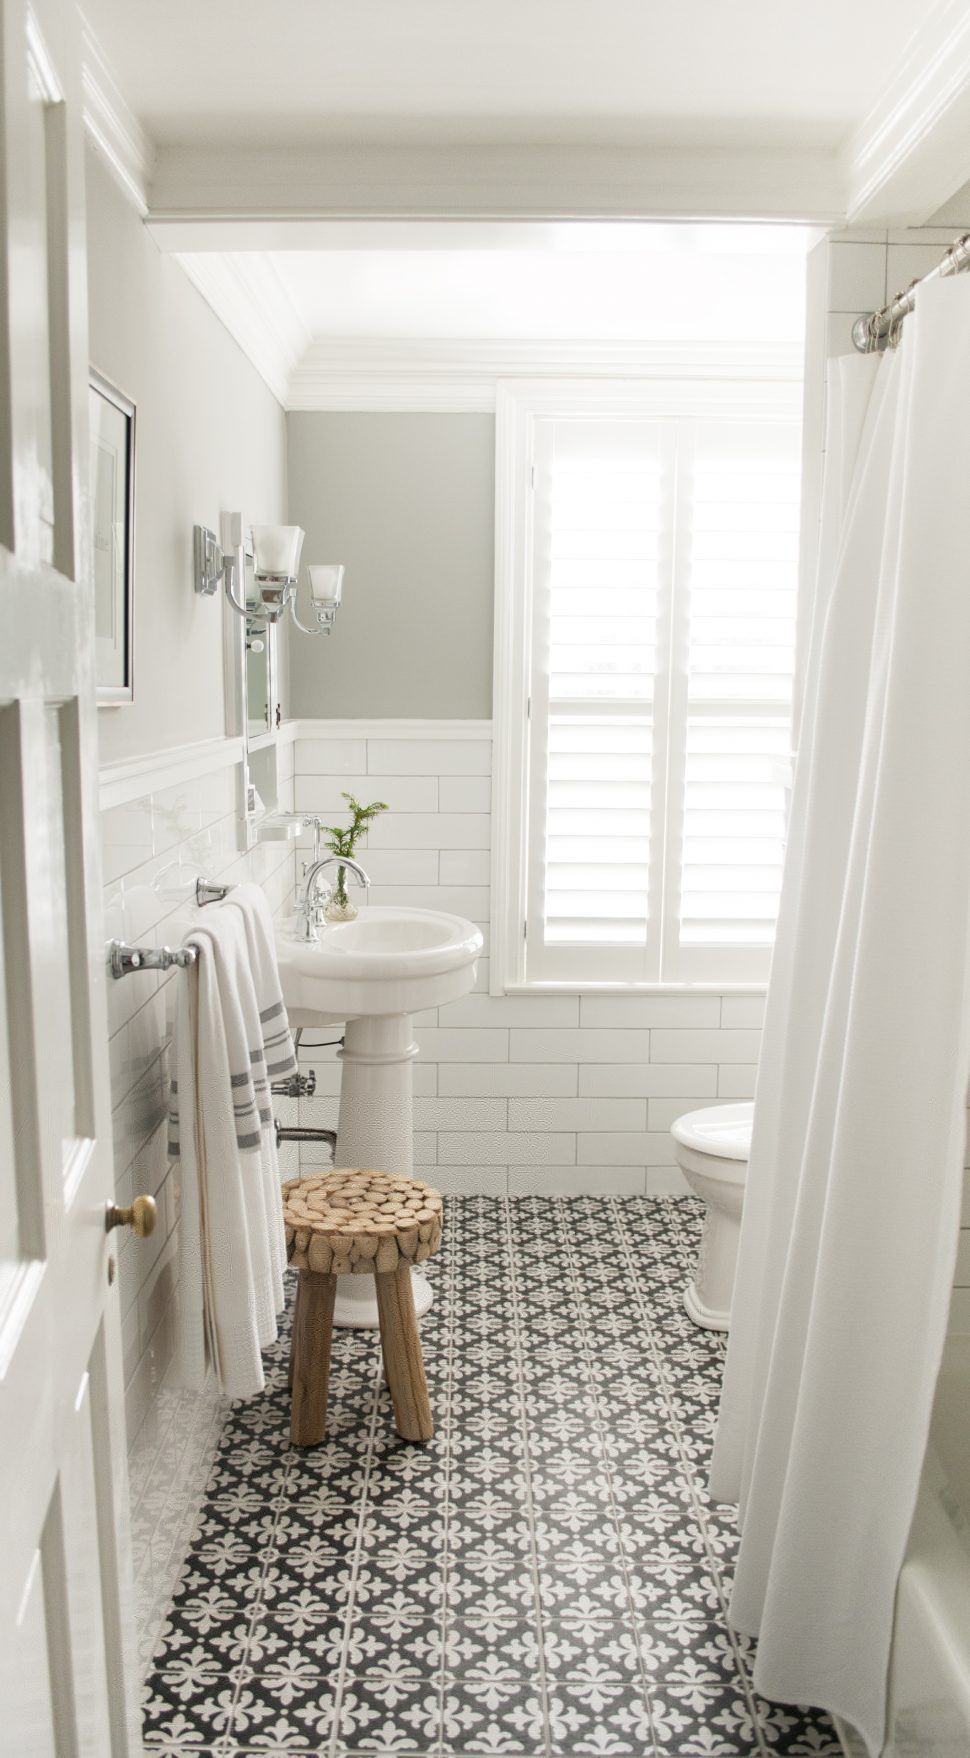 bathroom:Bathroom Tile Subway Green Cream Glamorous ...